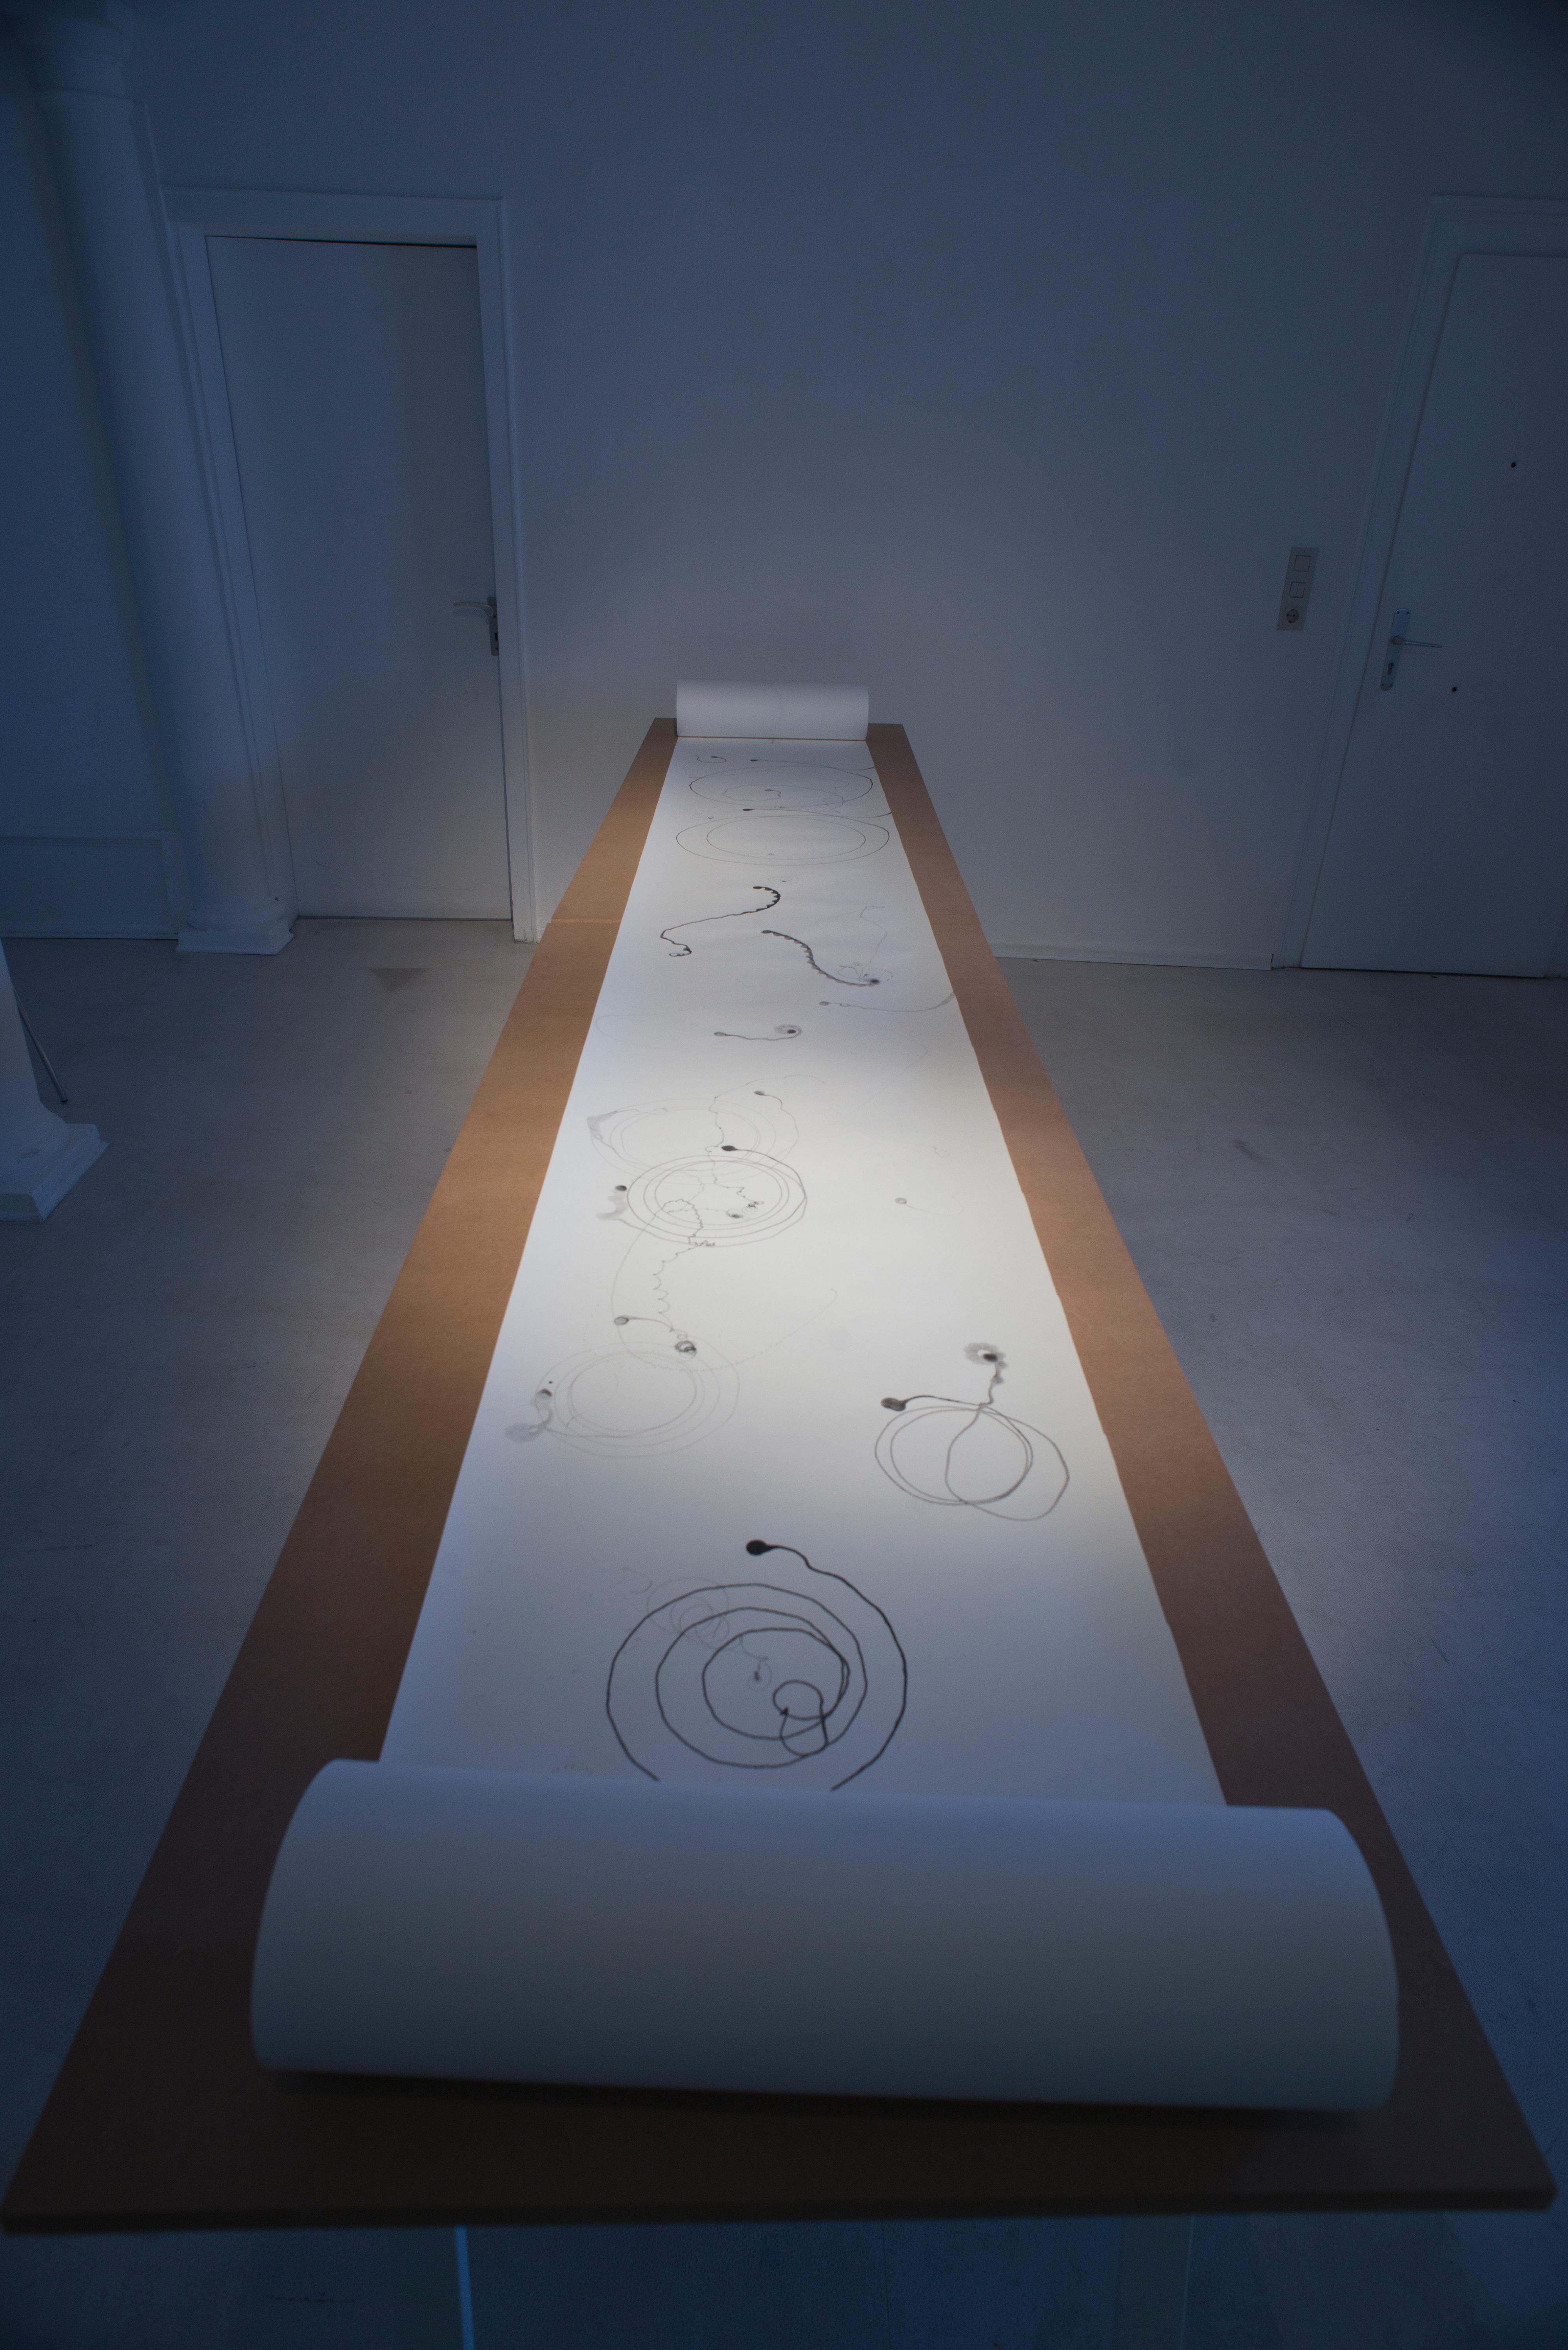 Galerie Barbara Thumm \ Antonio Paucar – movement matters